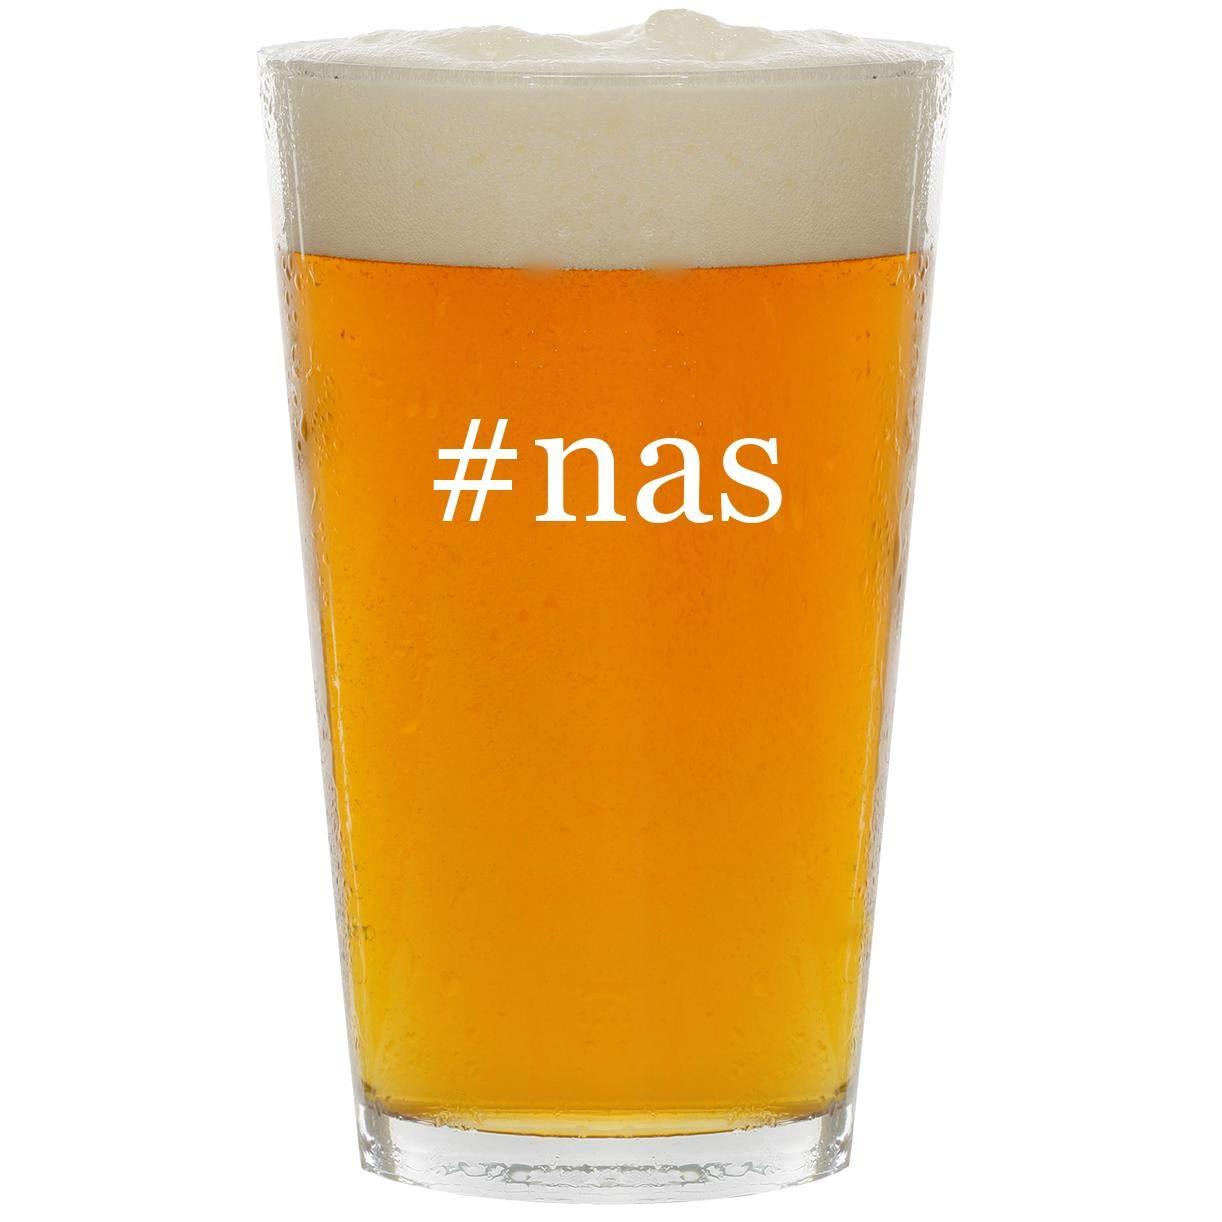 #nas - Glass Hashtag 16oz Beer Pint